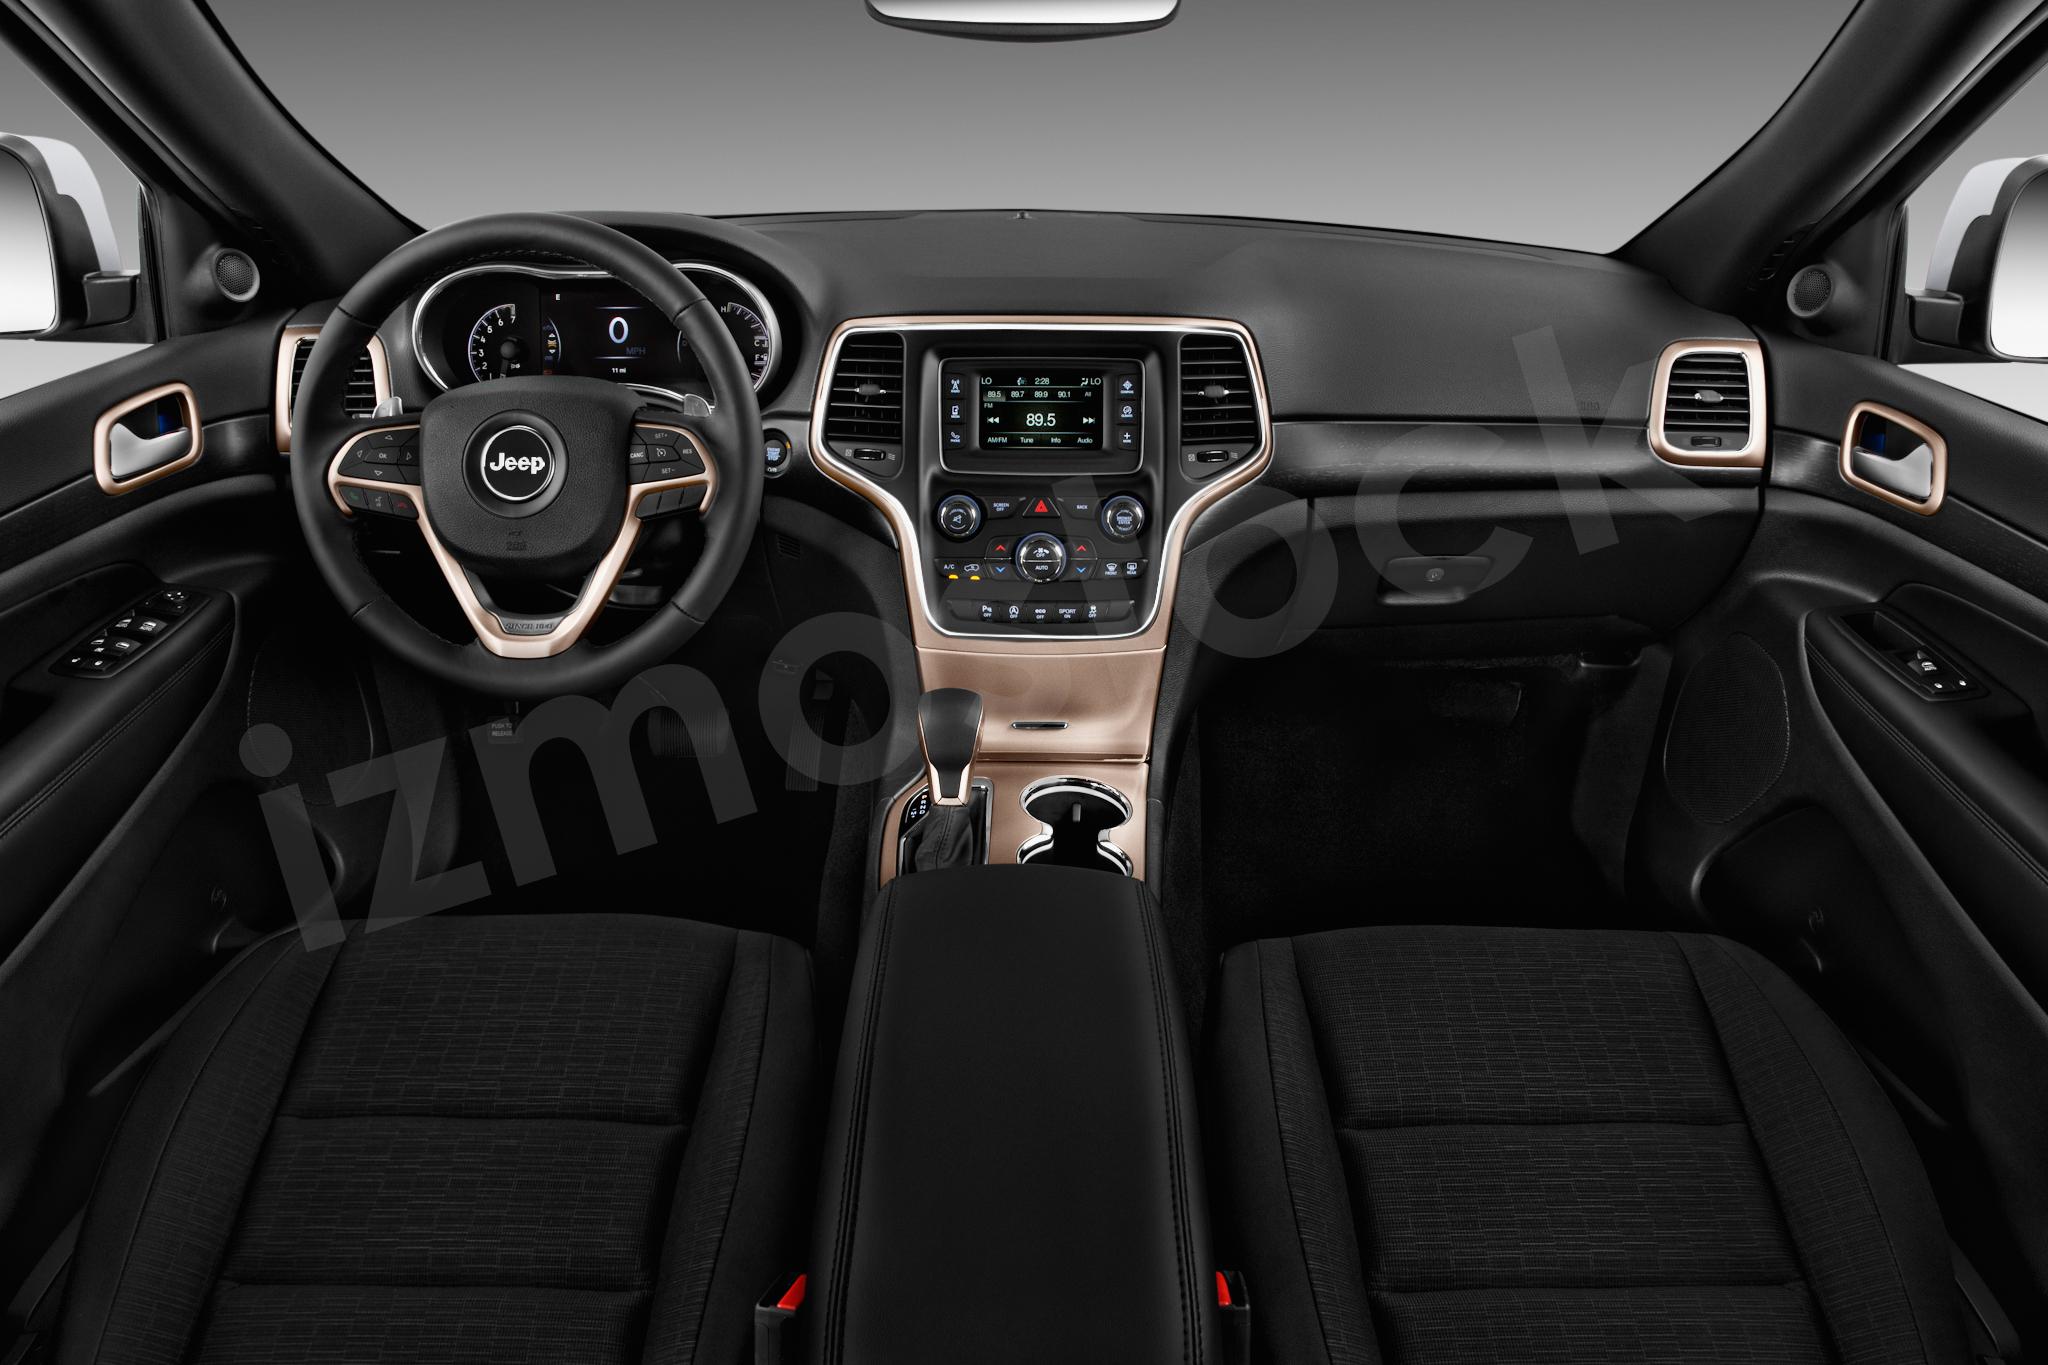 Unchallenged 2017 jeep grand cherokee laredo review - Jeep grand cherokee laredo interior ...